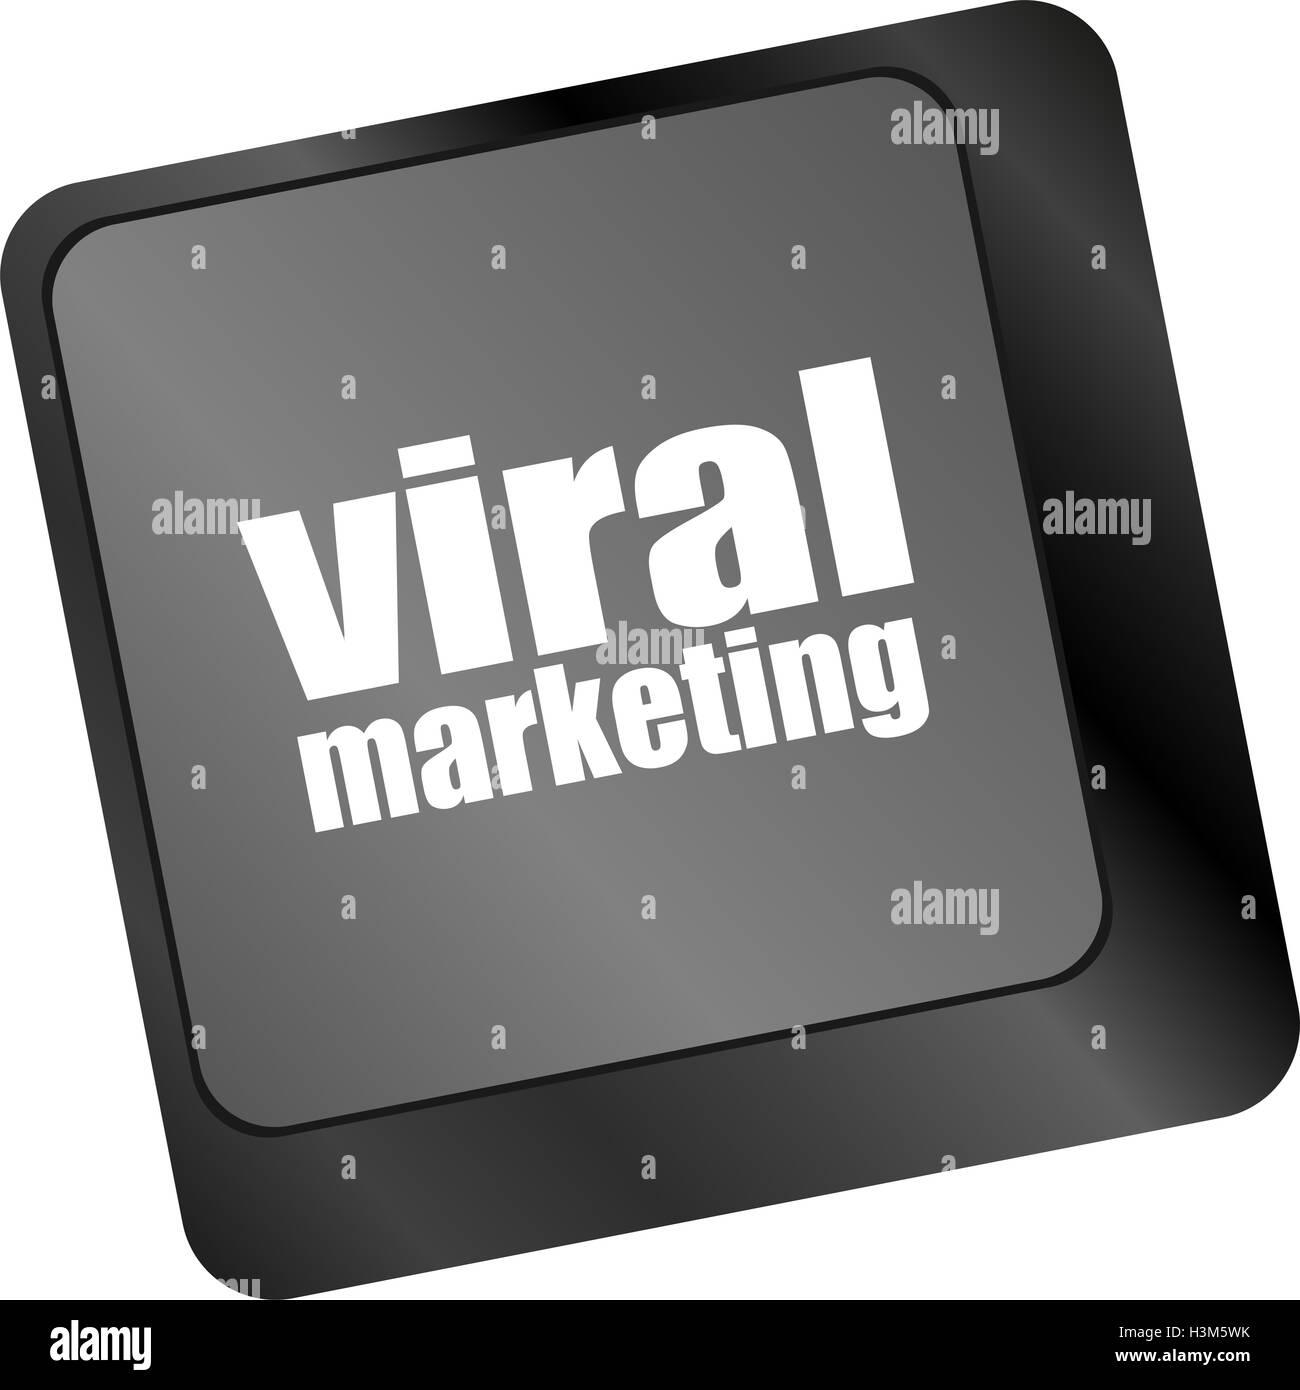 viral marketing word on computer keyboard key - Stock Image